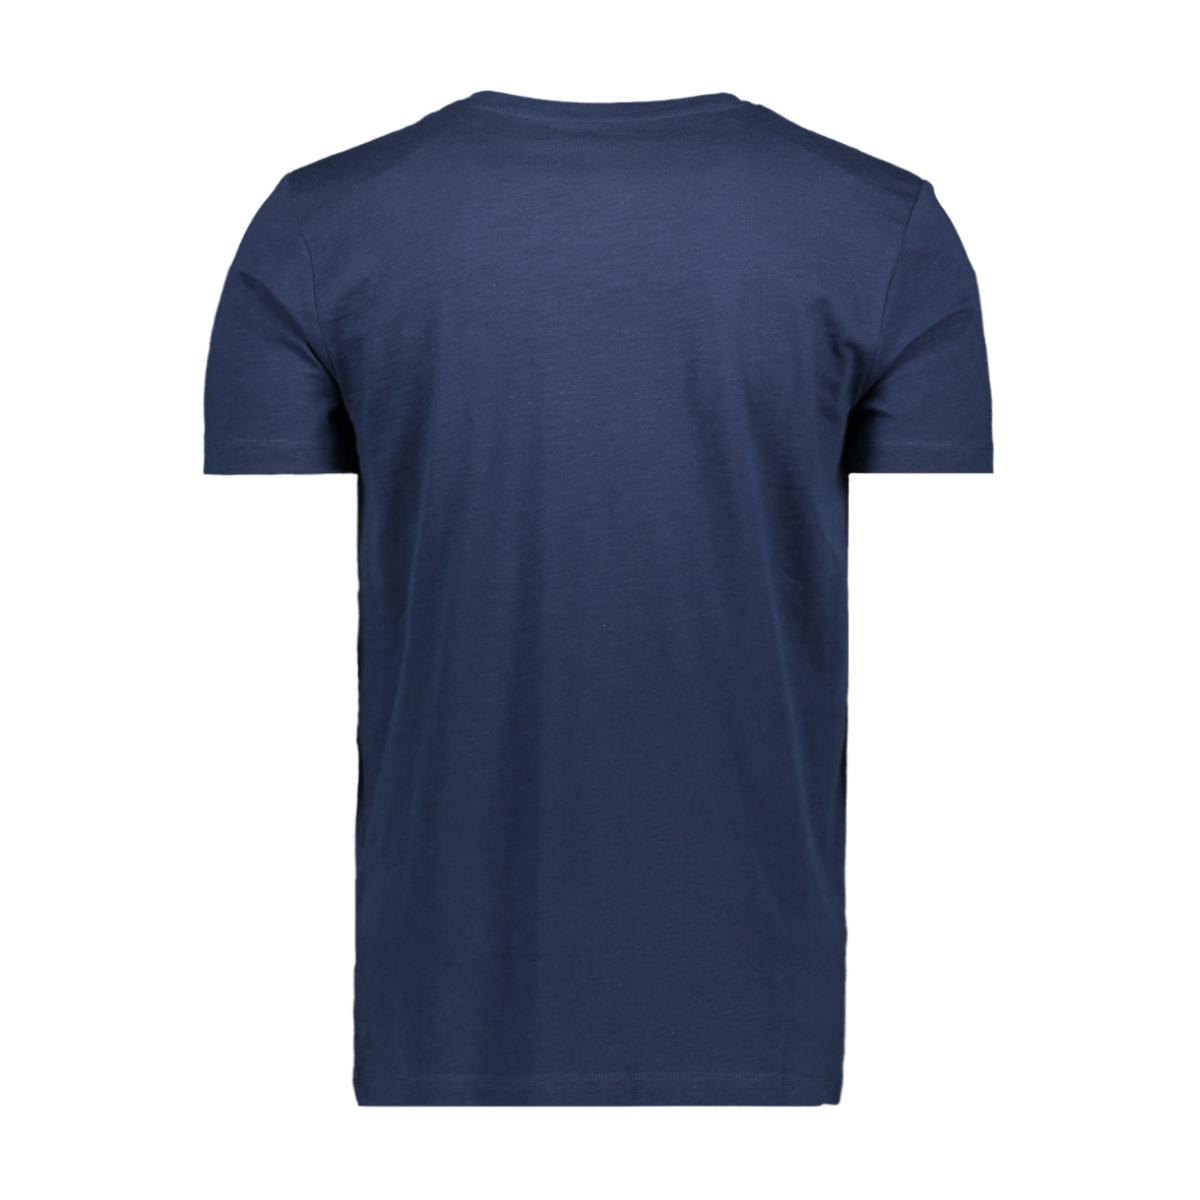 t shirt met print 1011136xx12 tom tailor t-shirt 10915